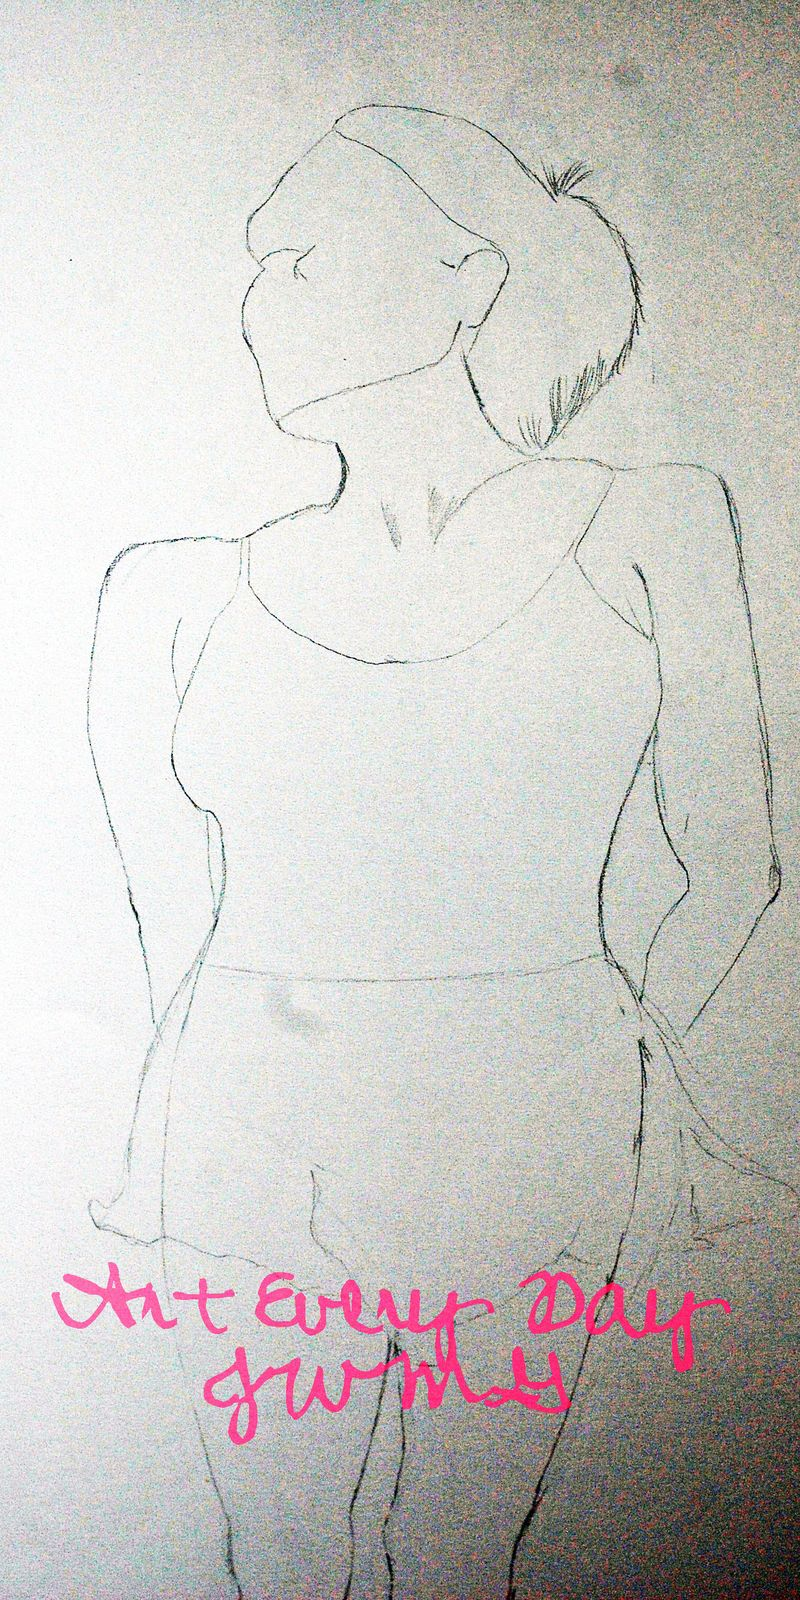 Up figure